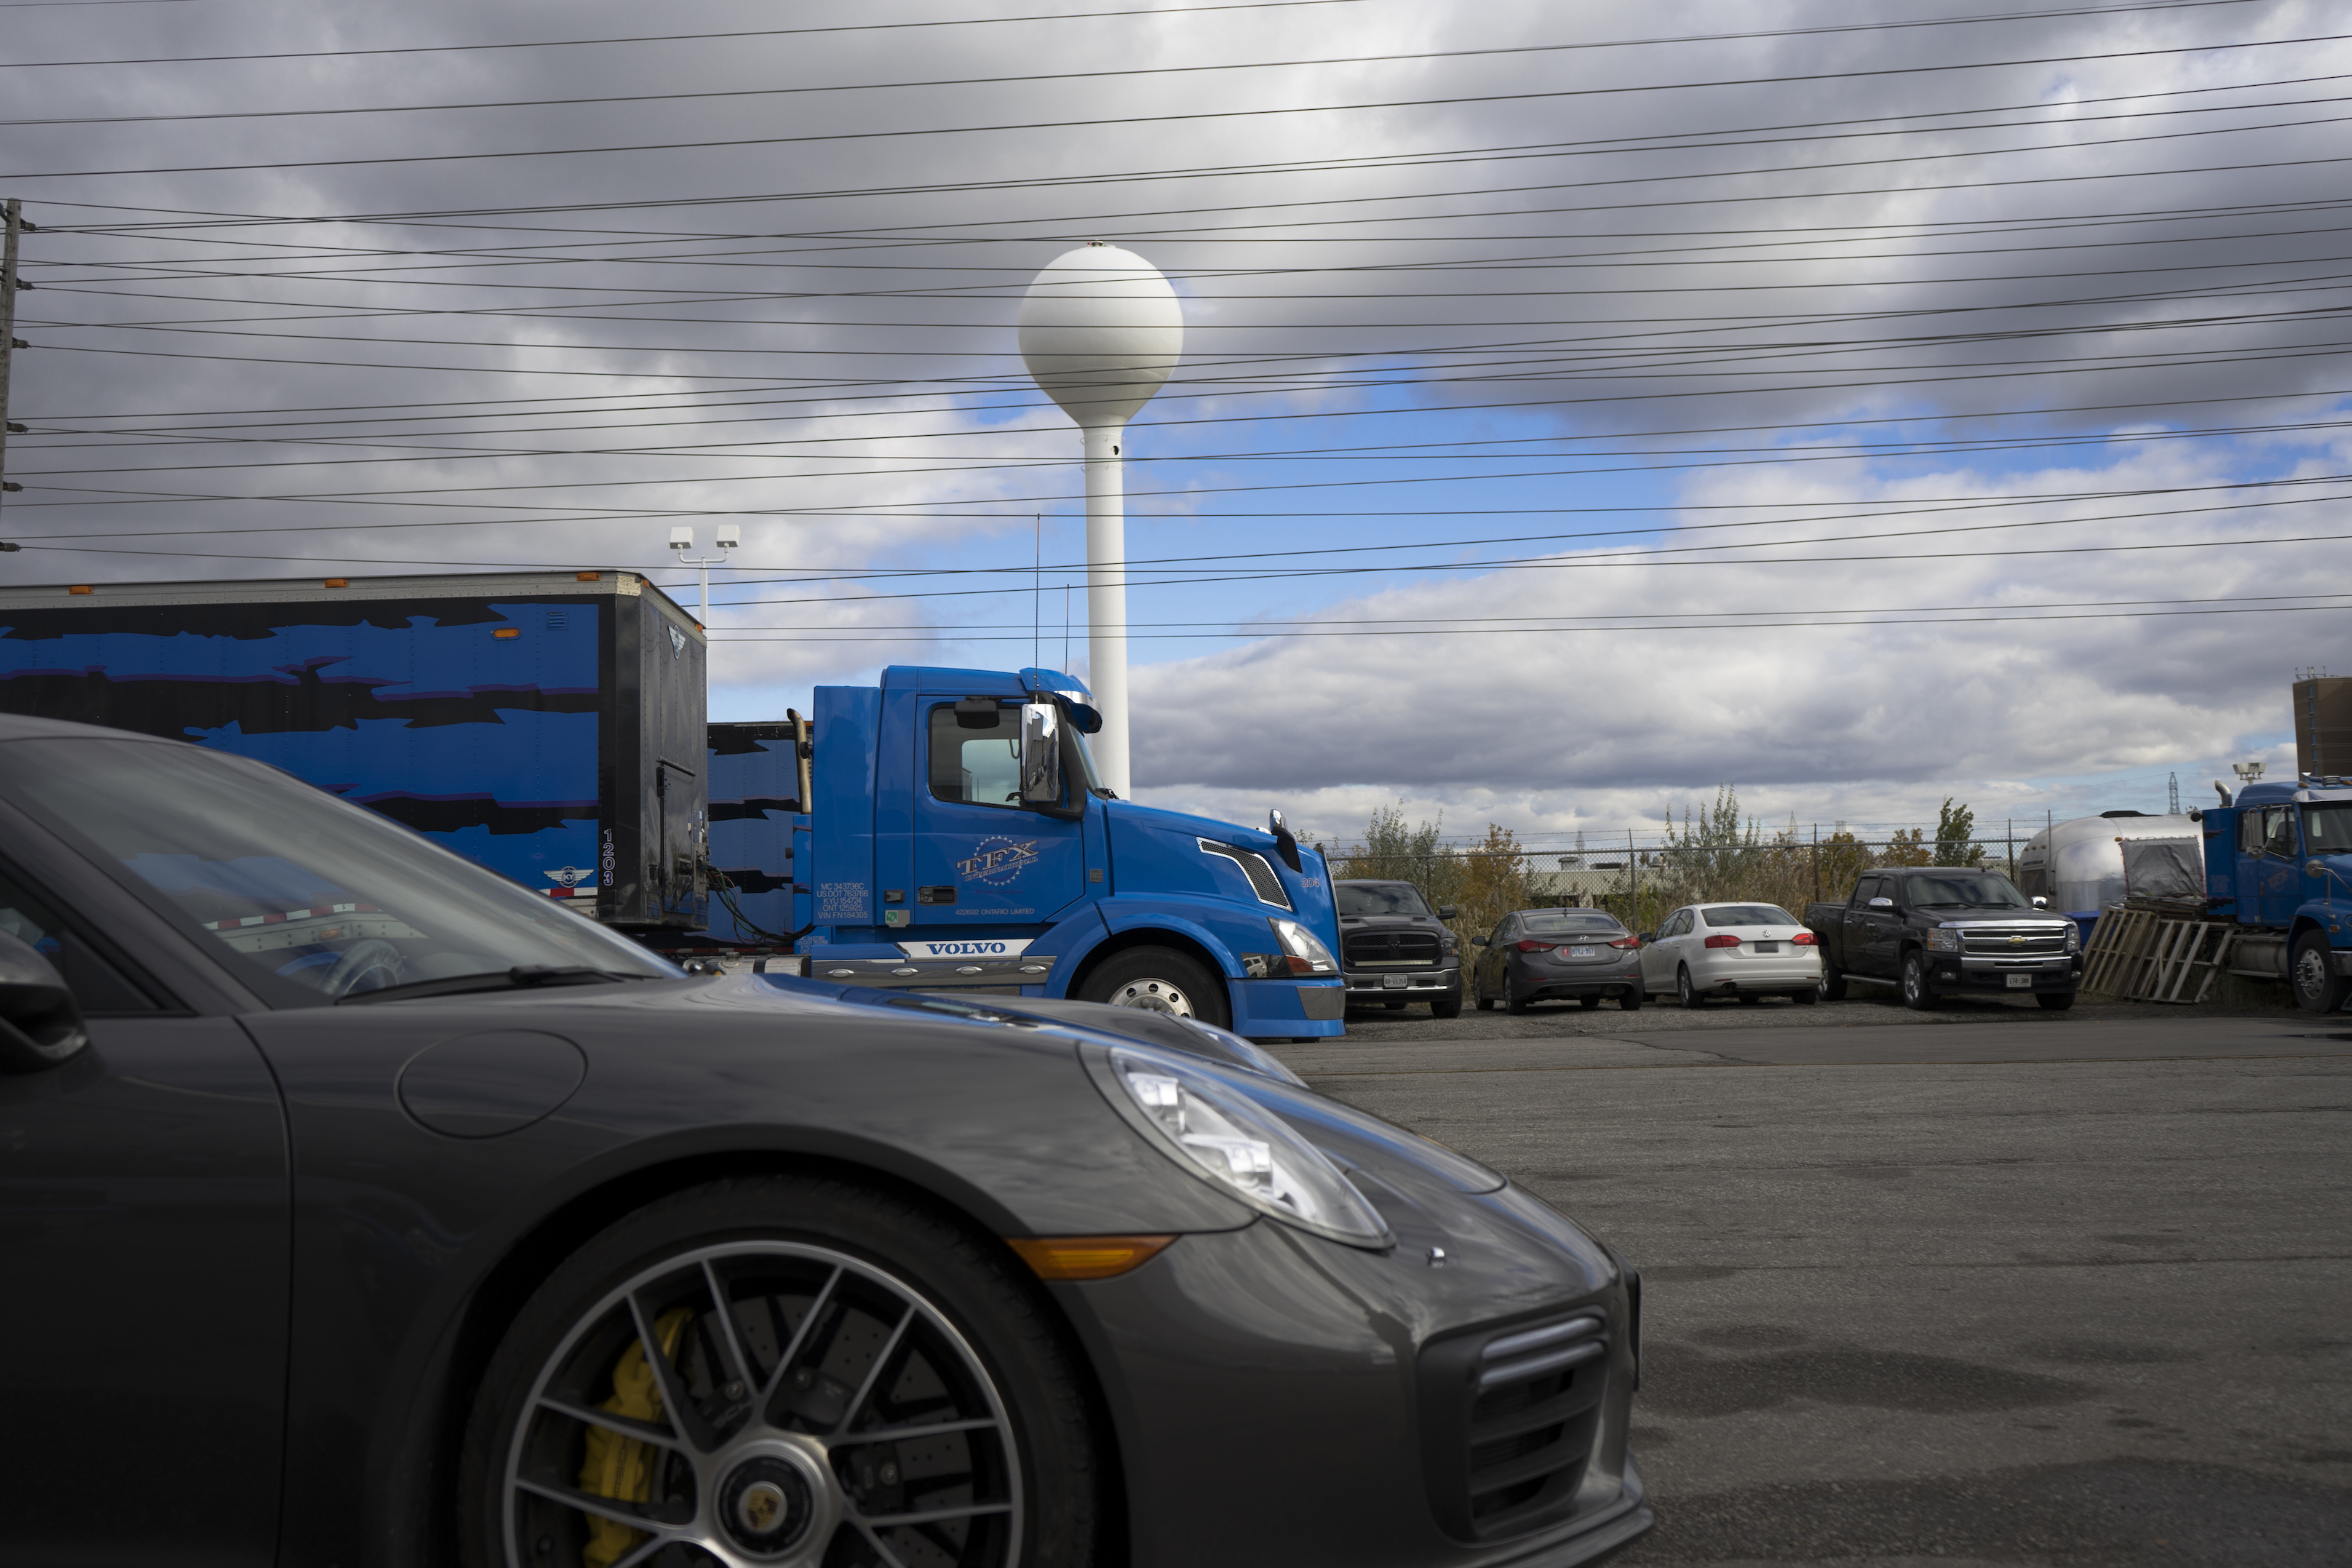 TFX headquarters 911 turbo s snowbird